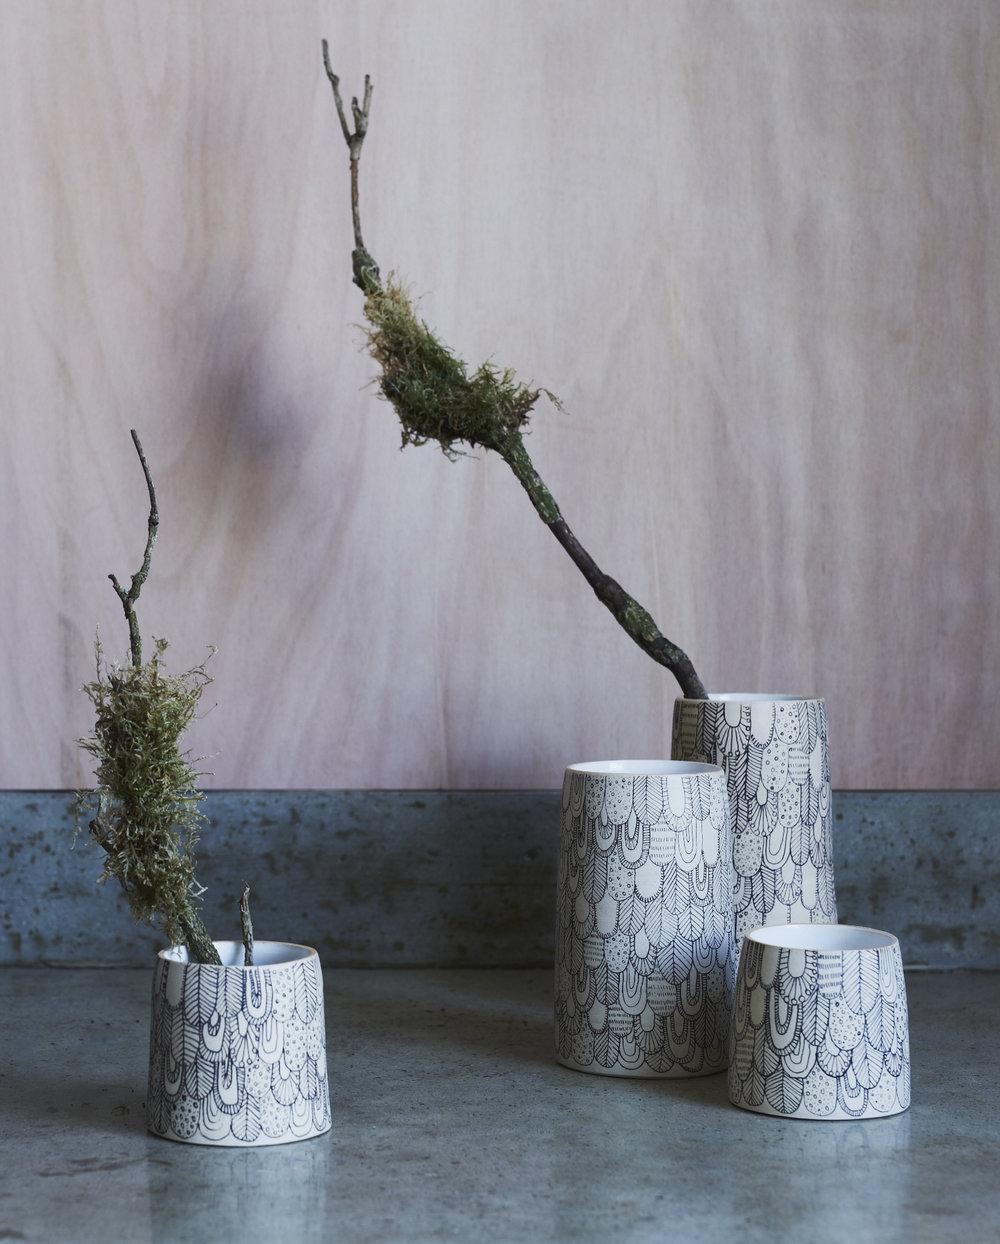 Muck Ceramics x Abigail Edwards limited edition Bird vessels